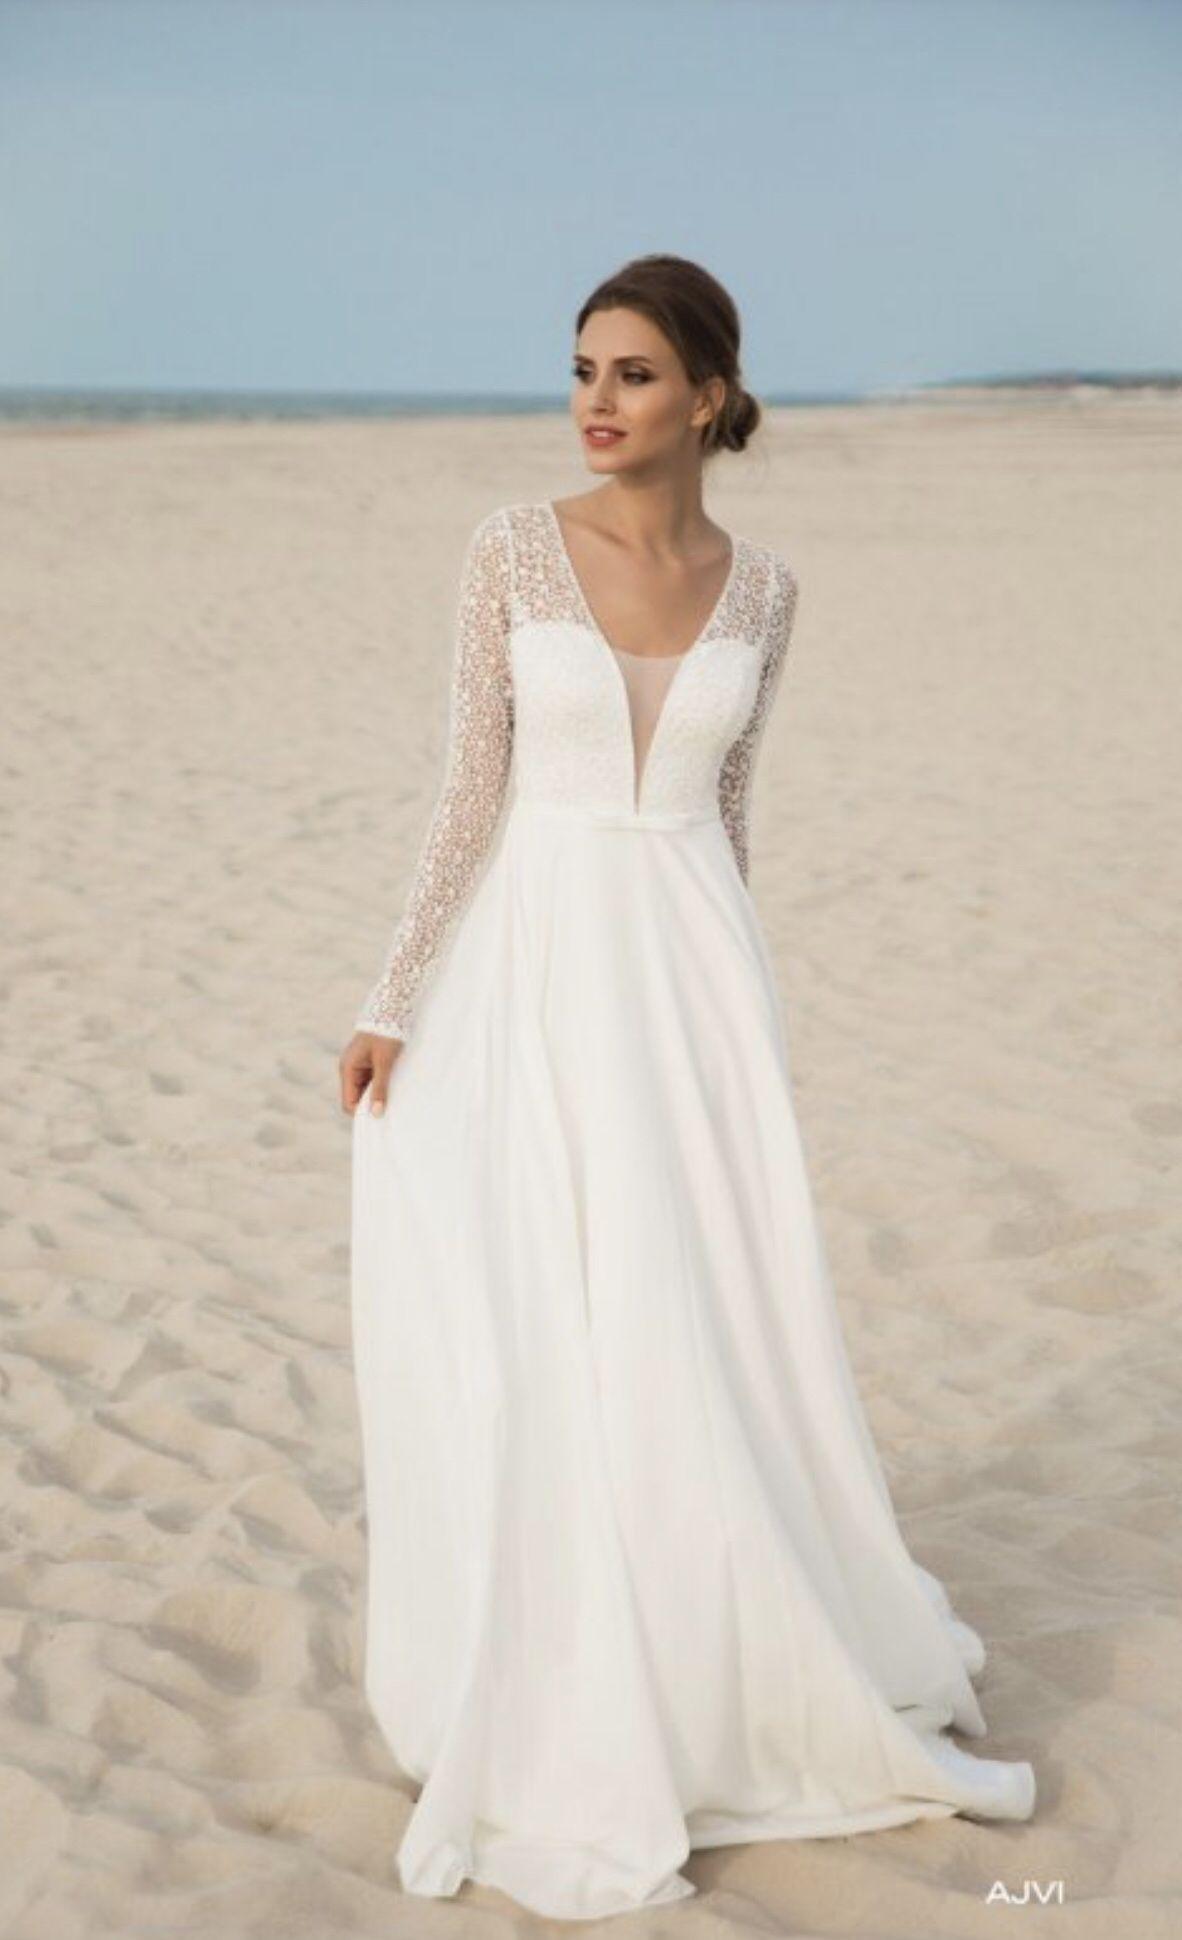 Le Rina - Brautkleid Ajvi - Hochzeitskleid, #Ajvi